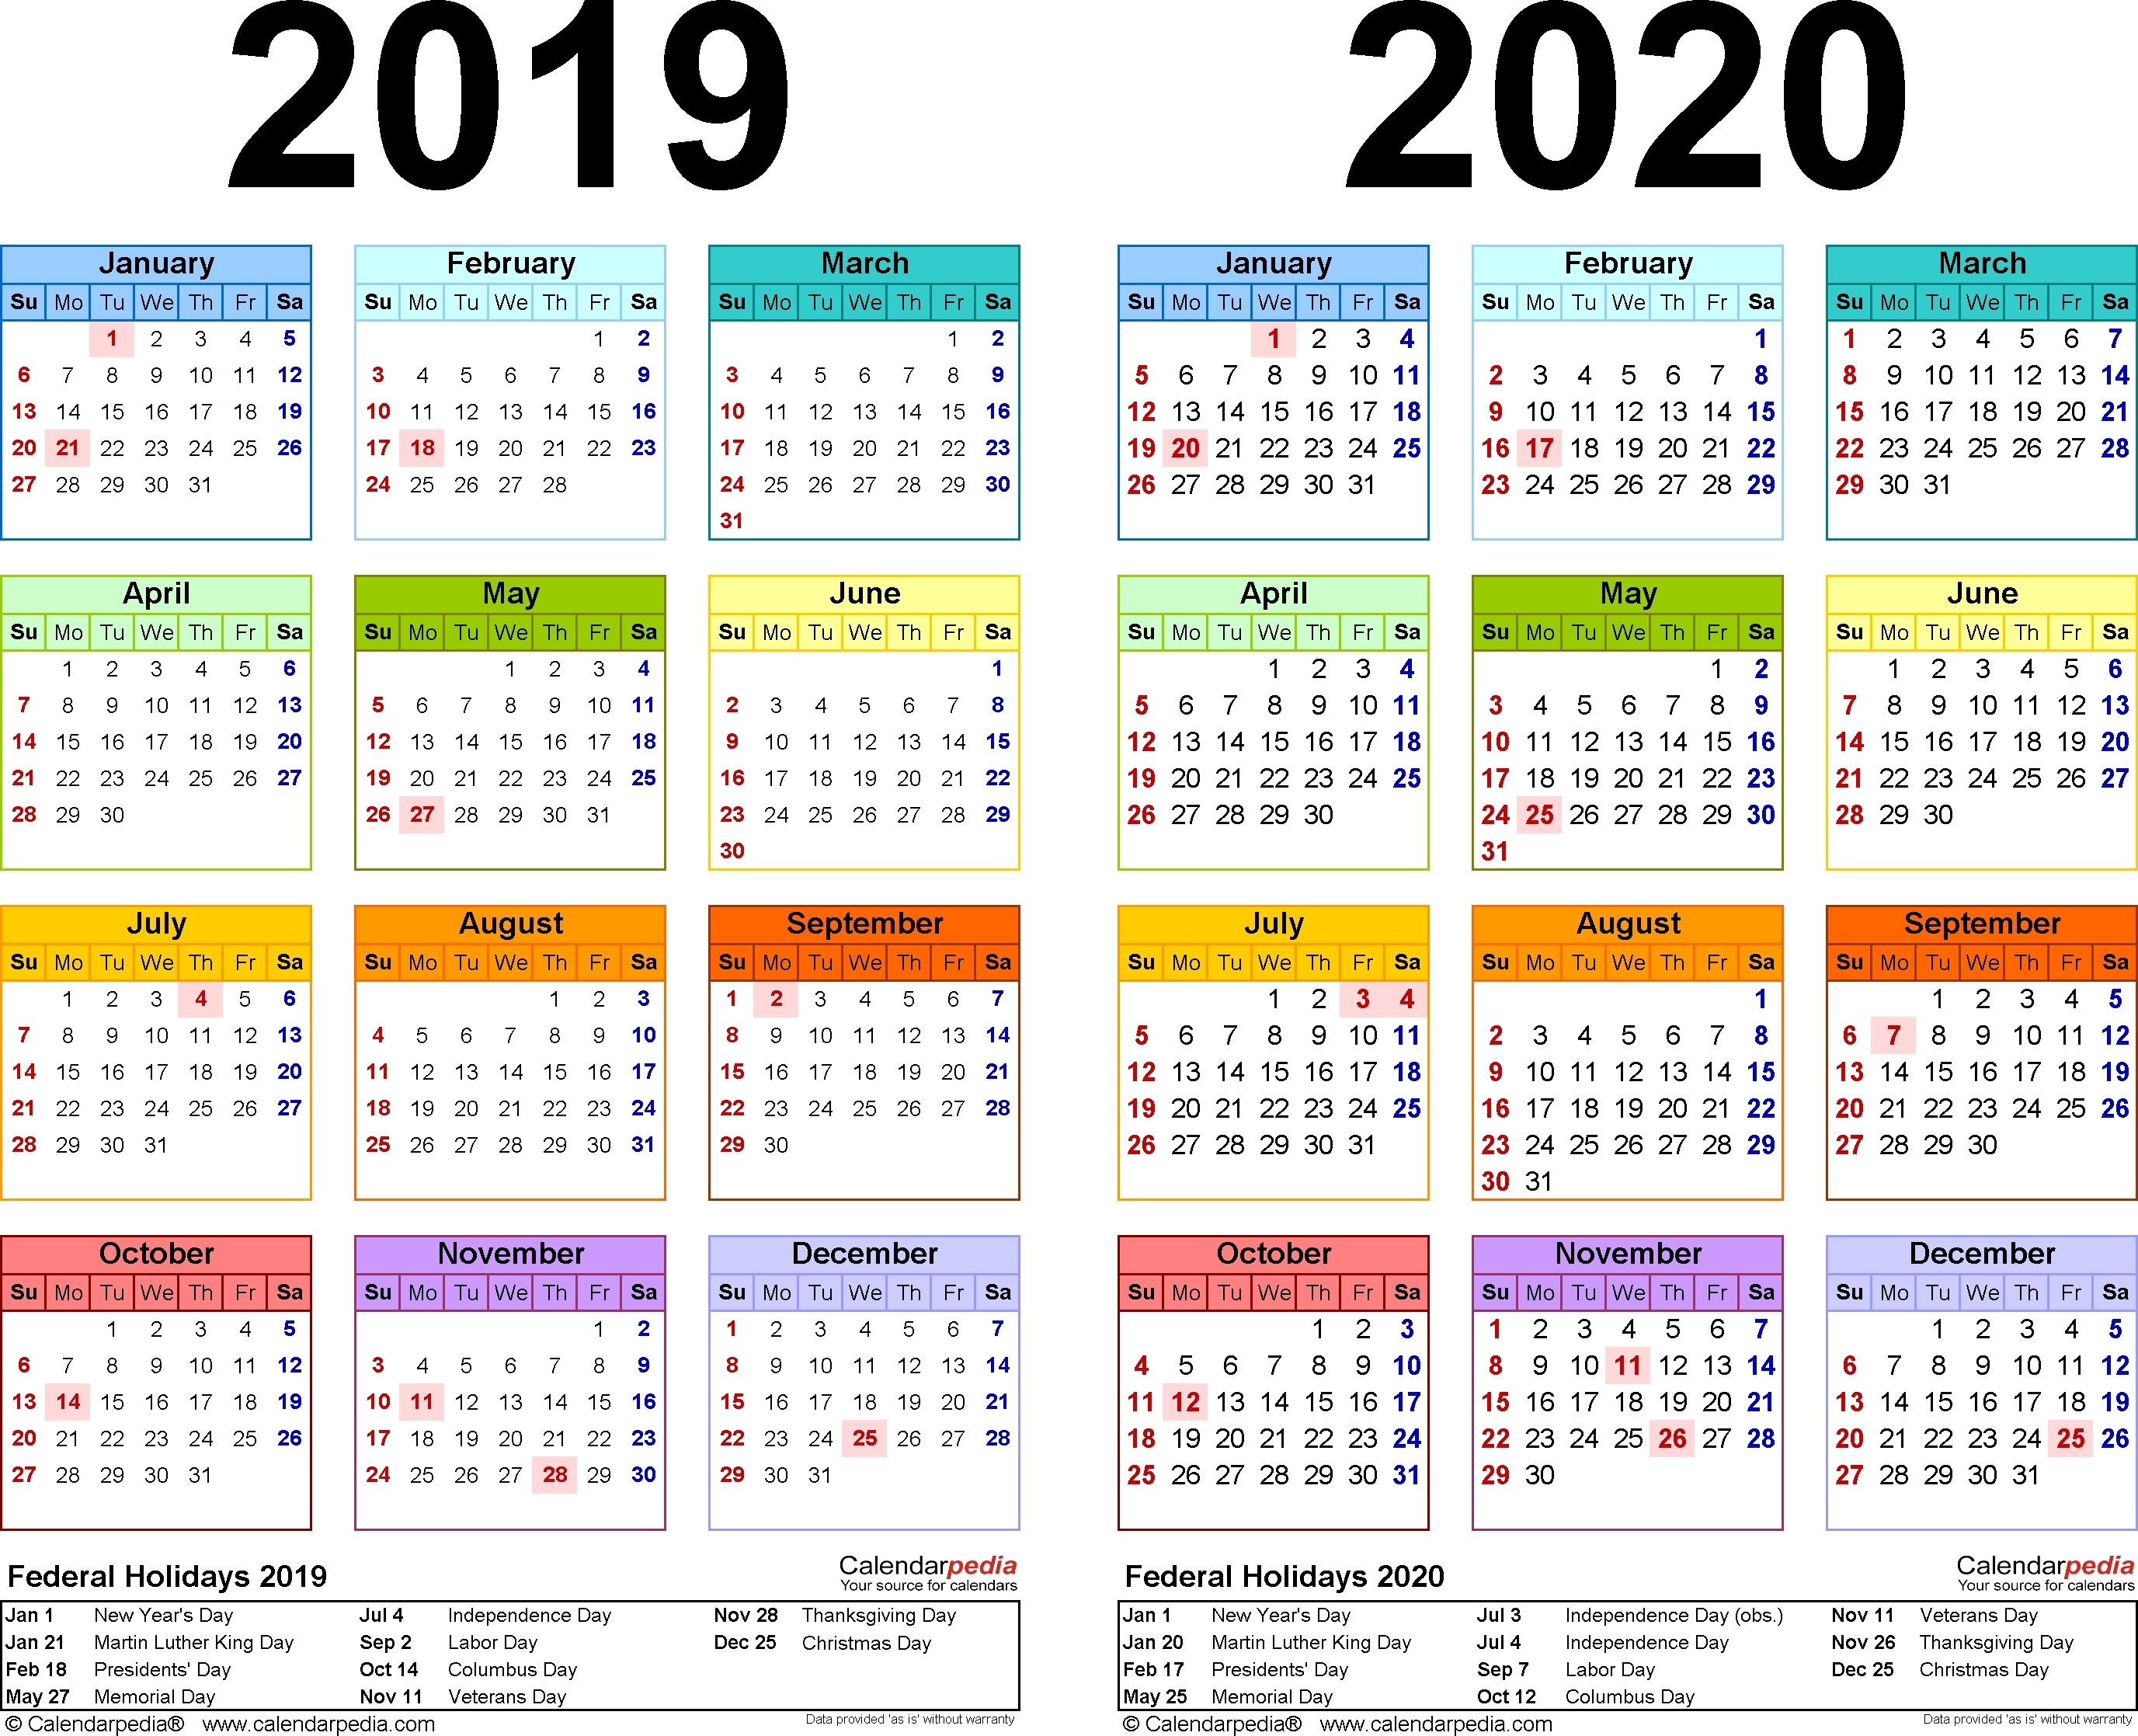 2020 18 School Calendar Template - Cerno.mioduchowski